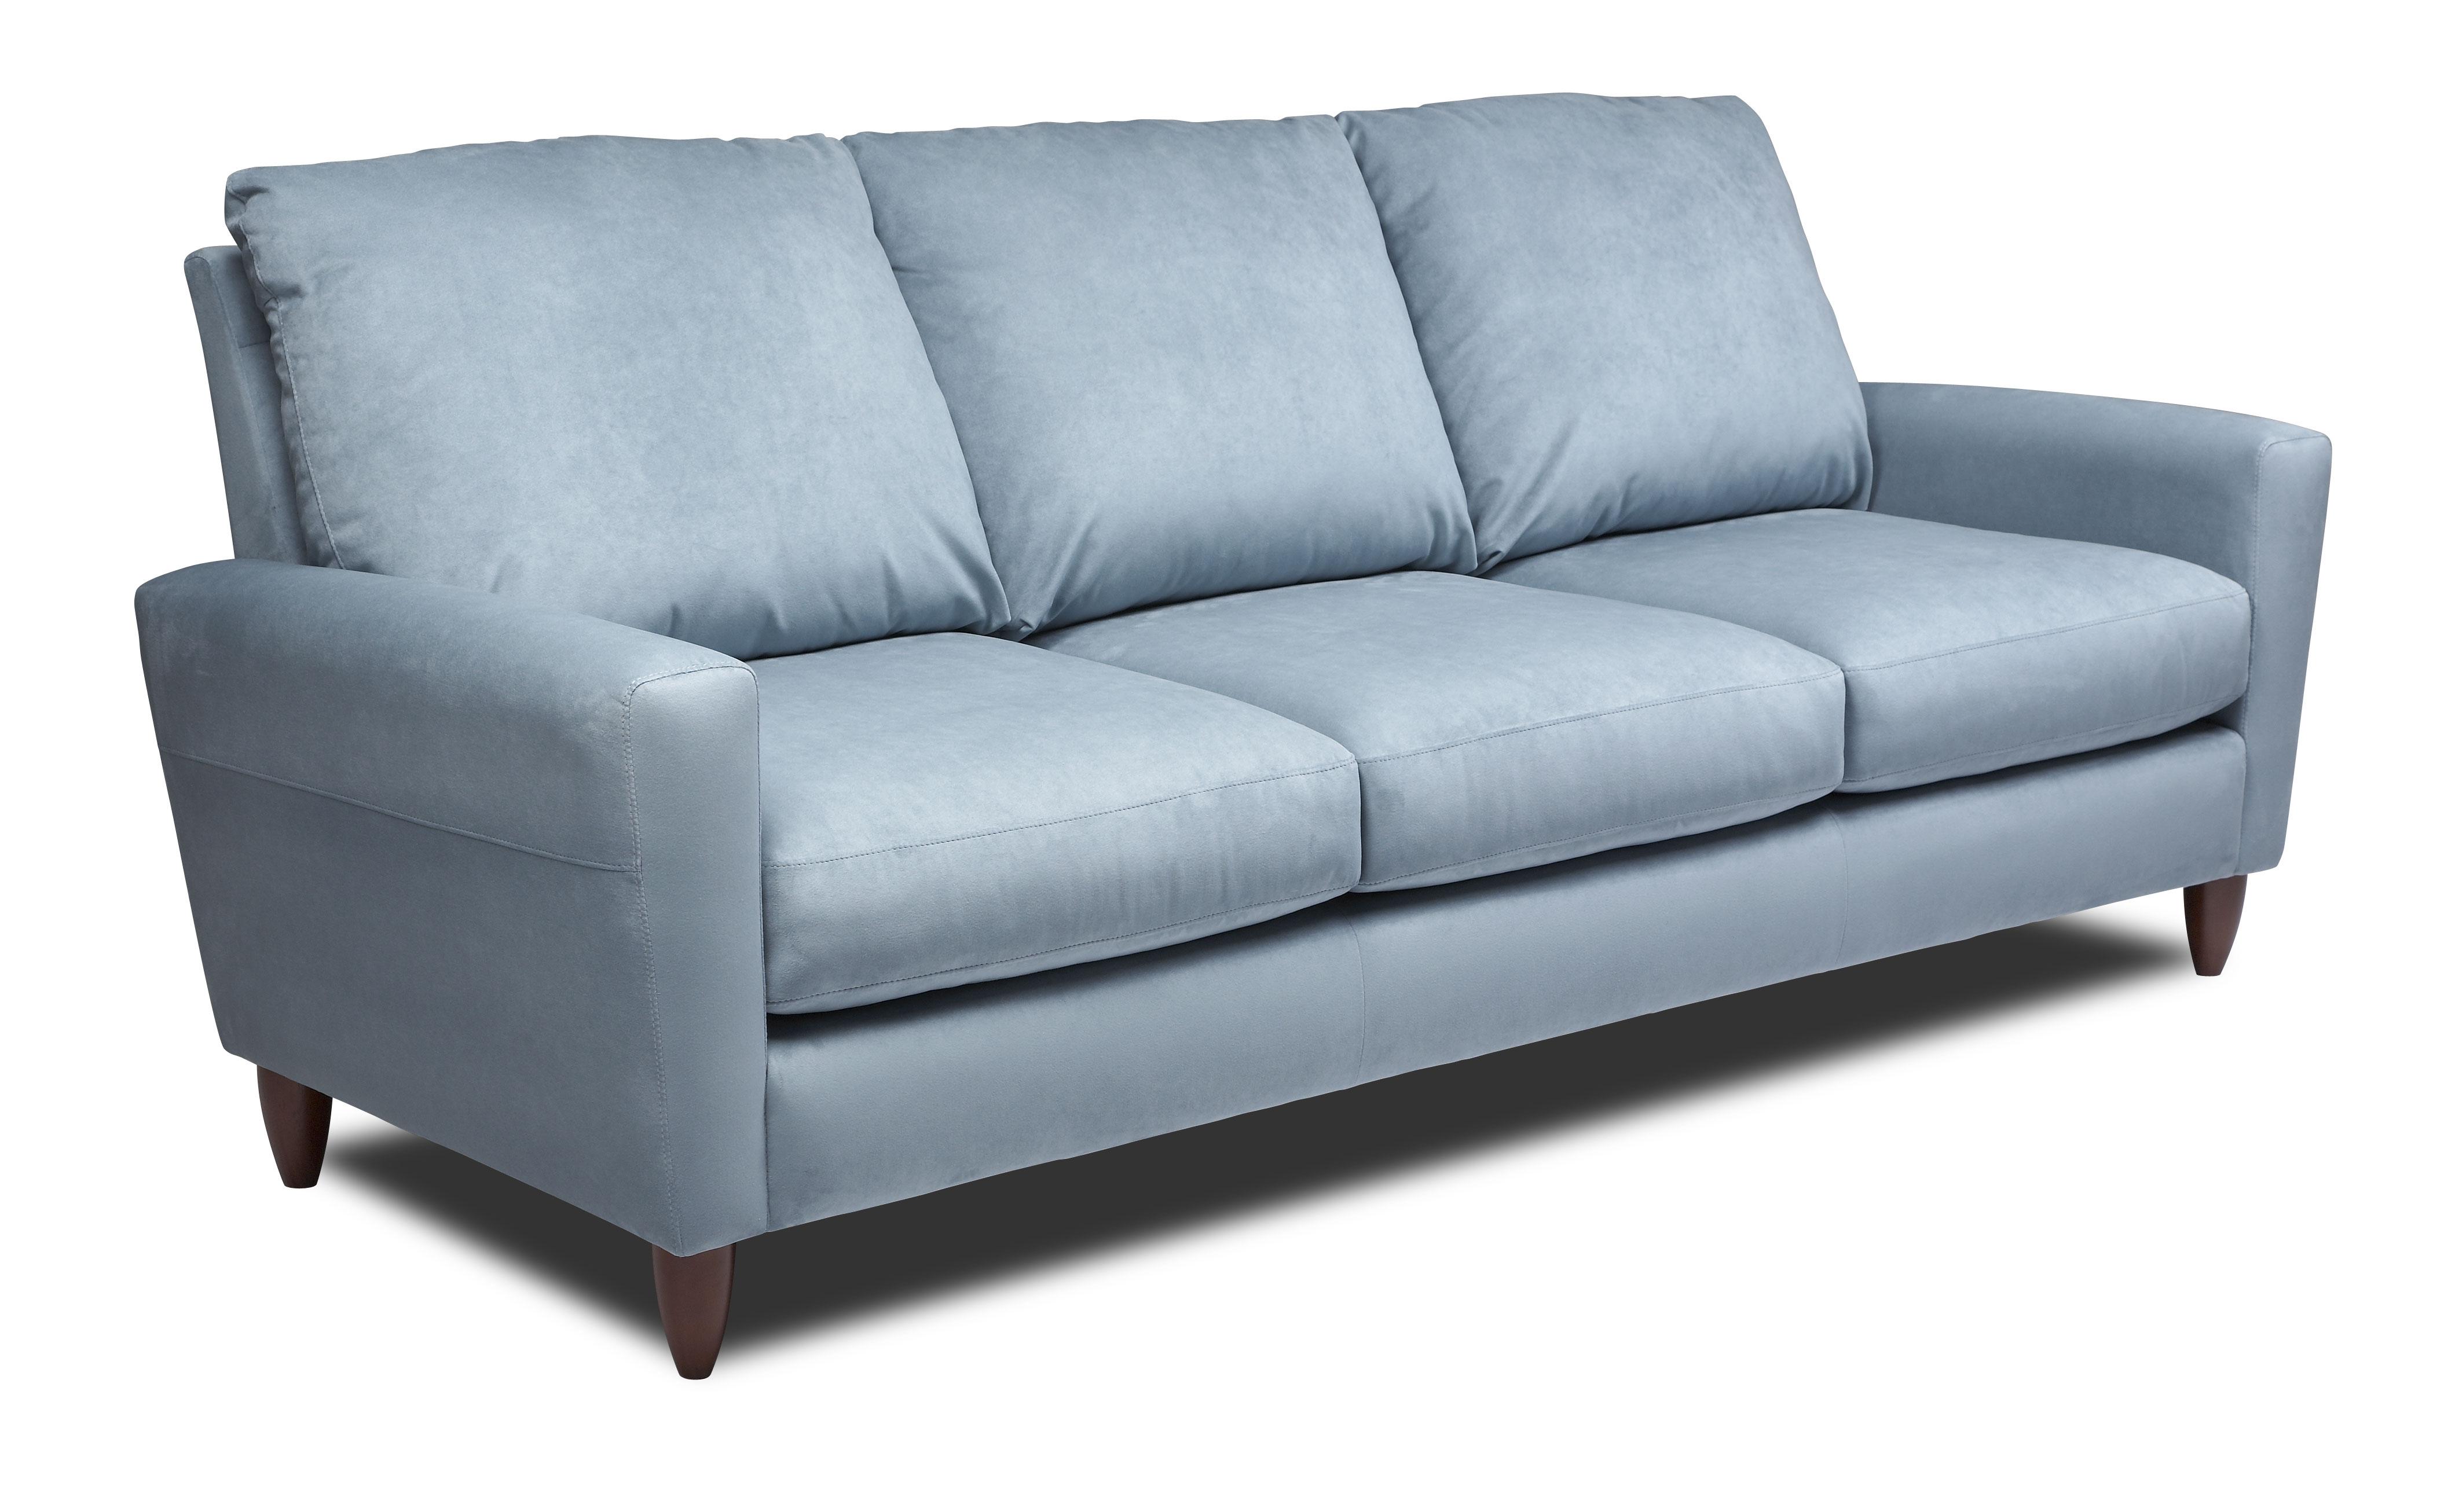 Exceptionnel Bennet Sofa ...